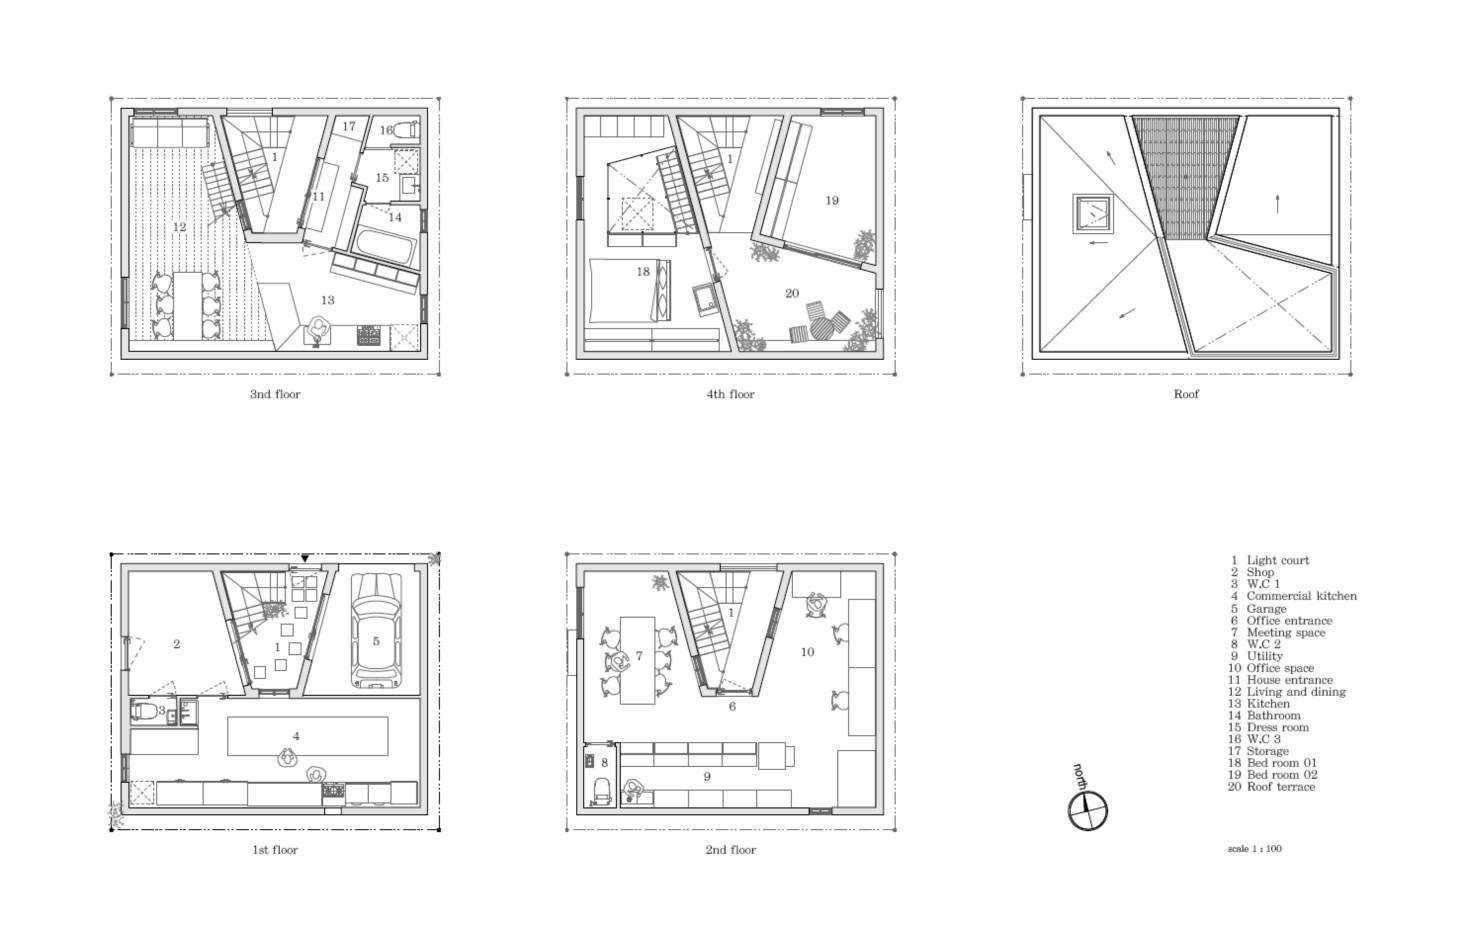 The floor plans.